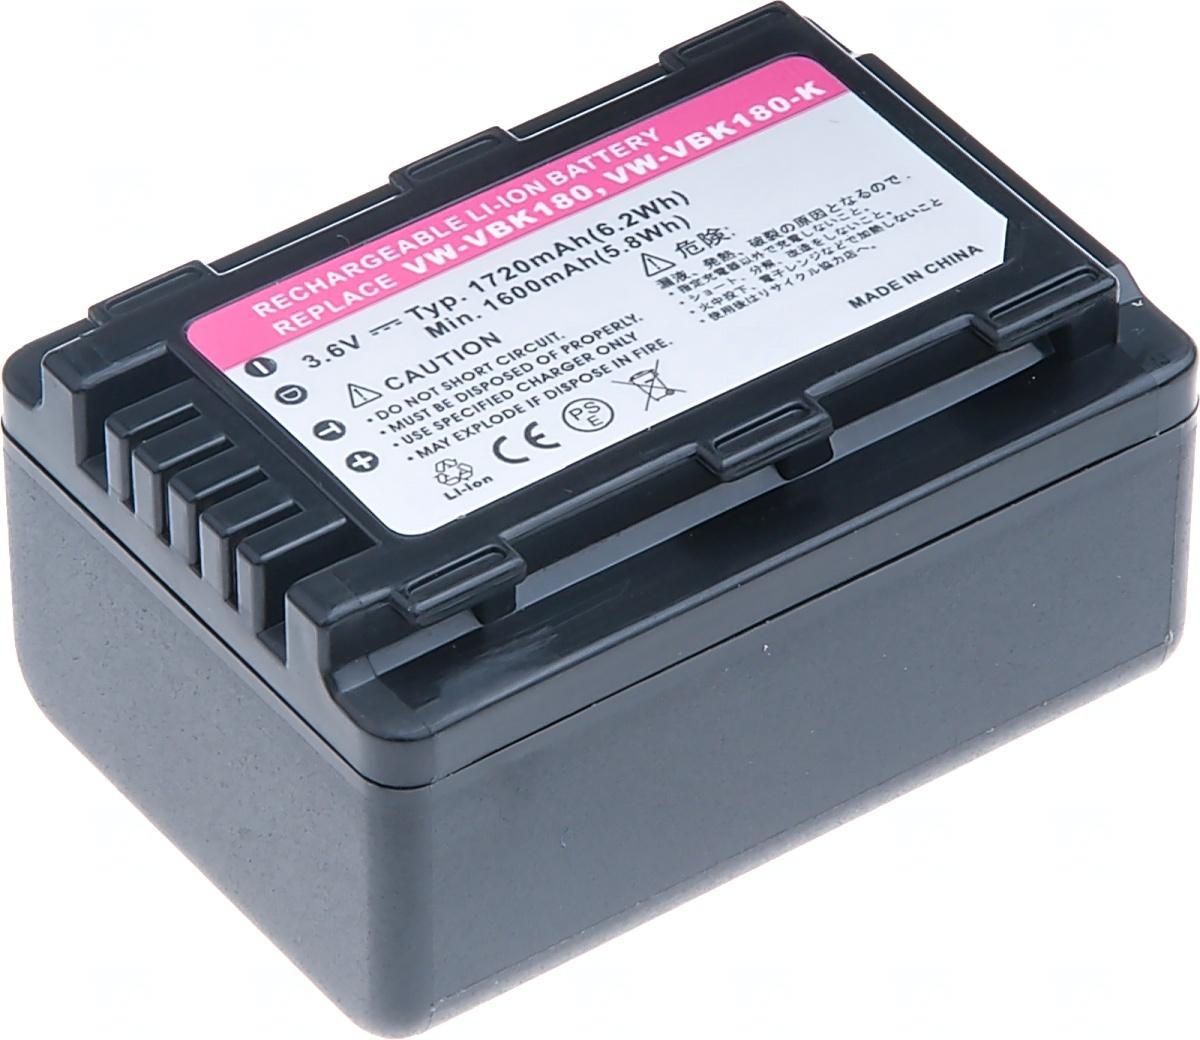 Baterie T6 power Panasonic VW-VBK180, 1720mAh, černá (Baterie a gripy)